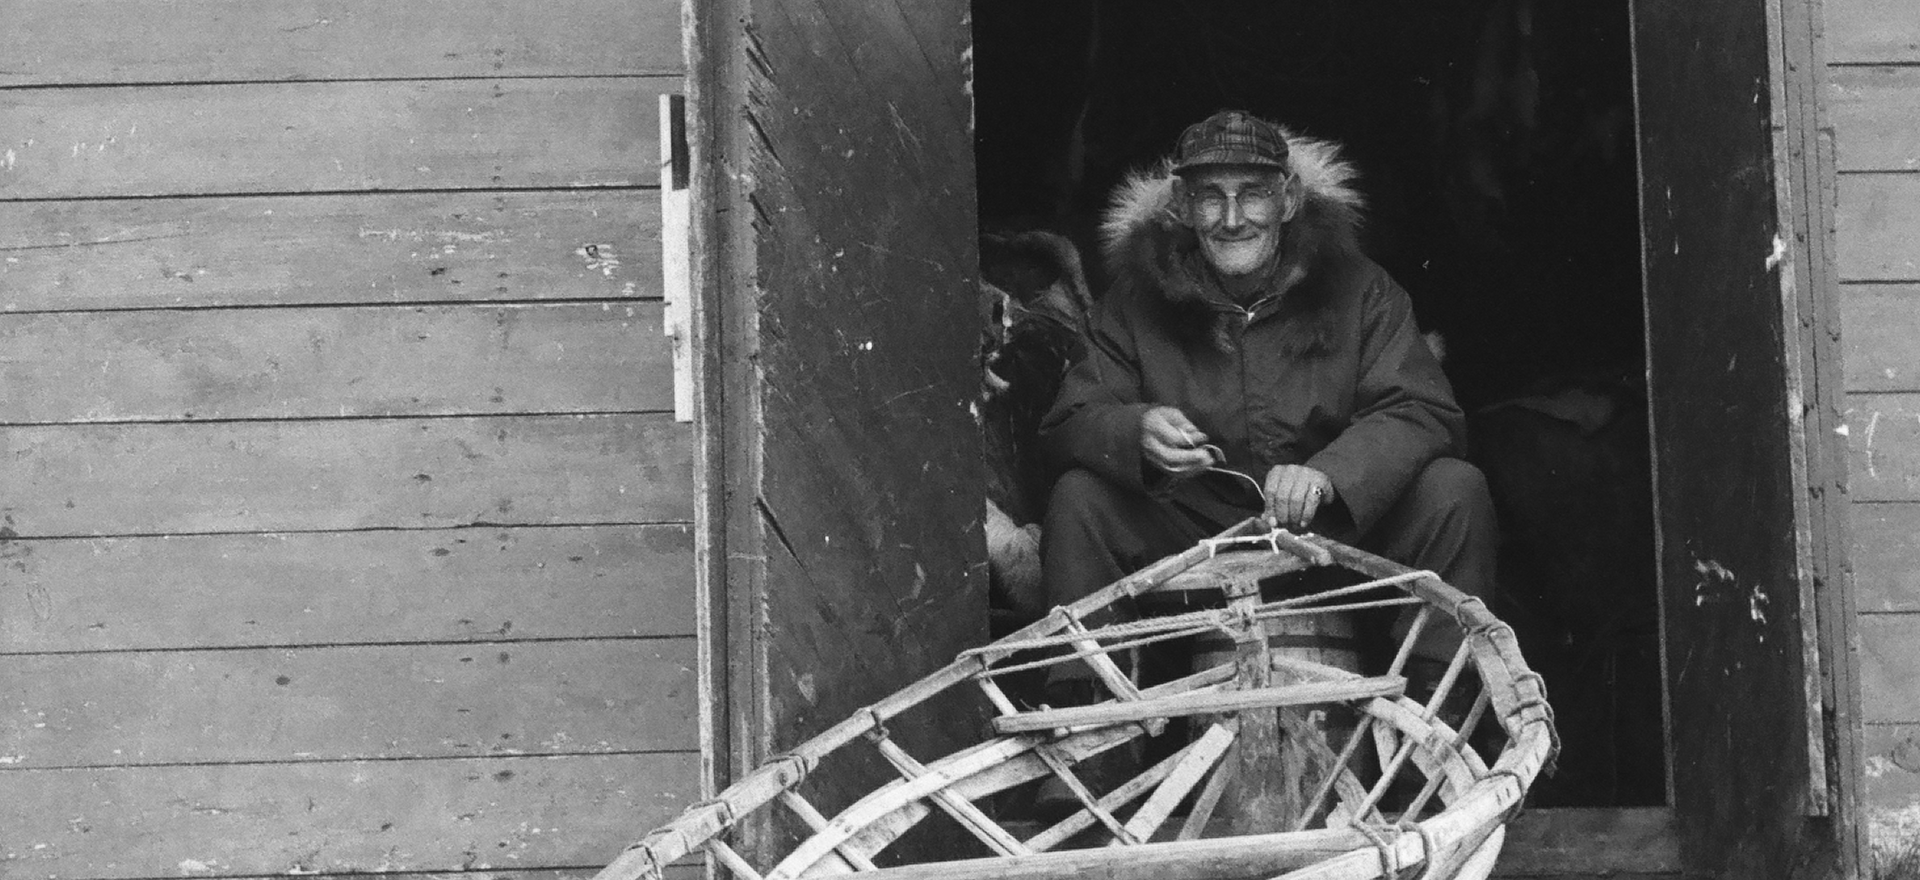 Kusiq Bodfish working on an umiaqaluraq in Wainwright, fall 1964.